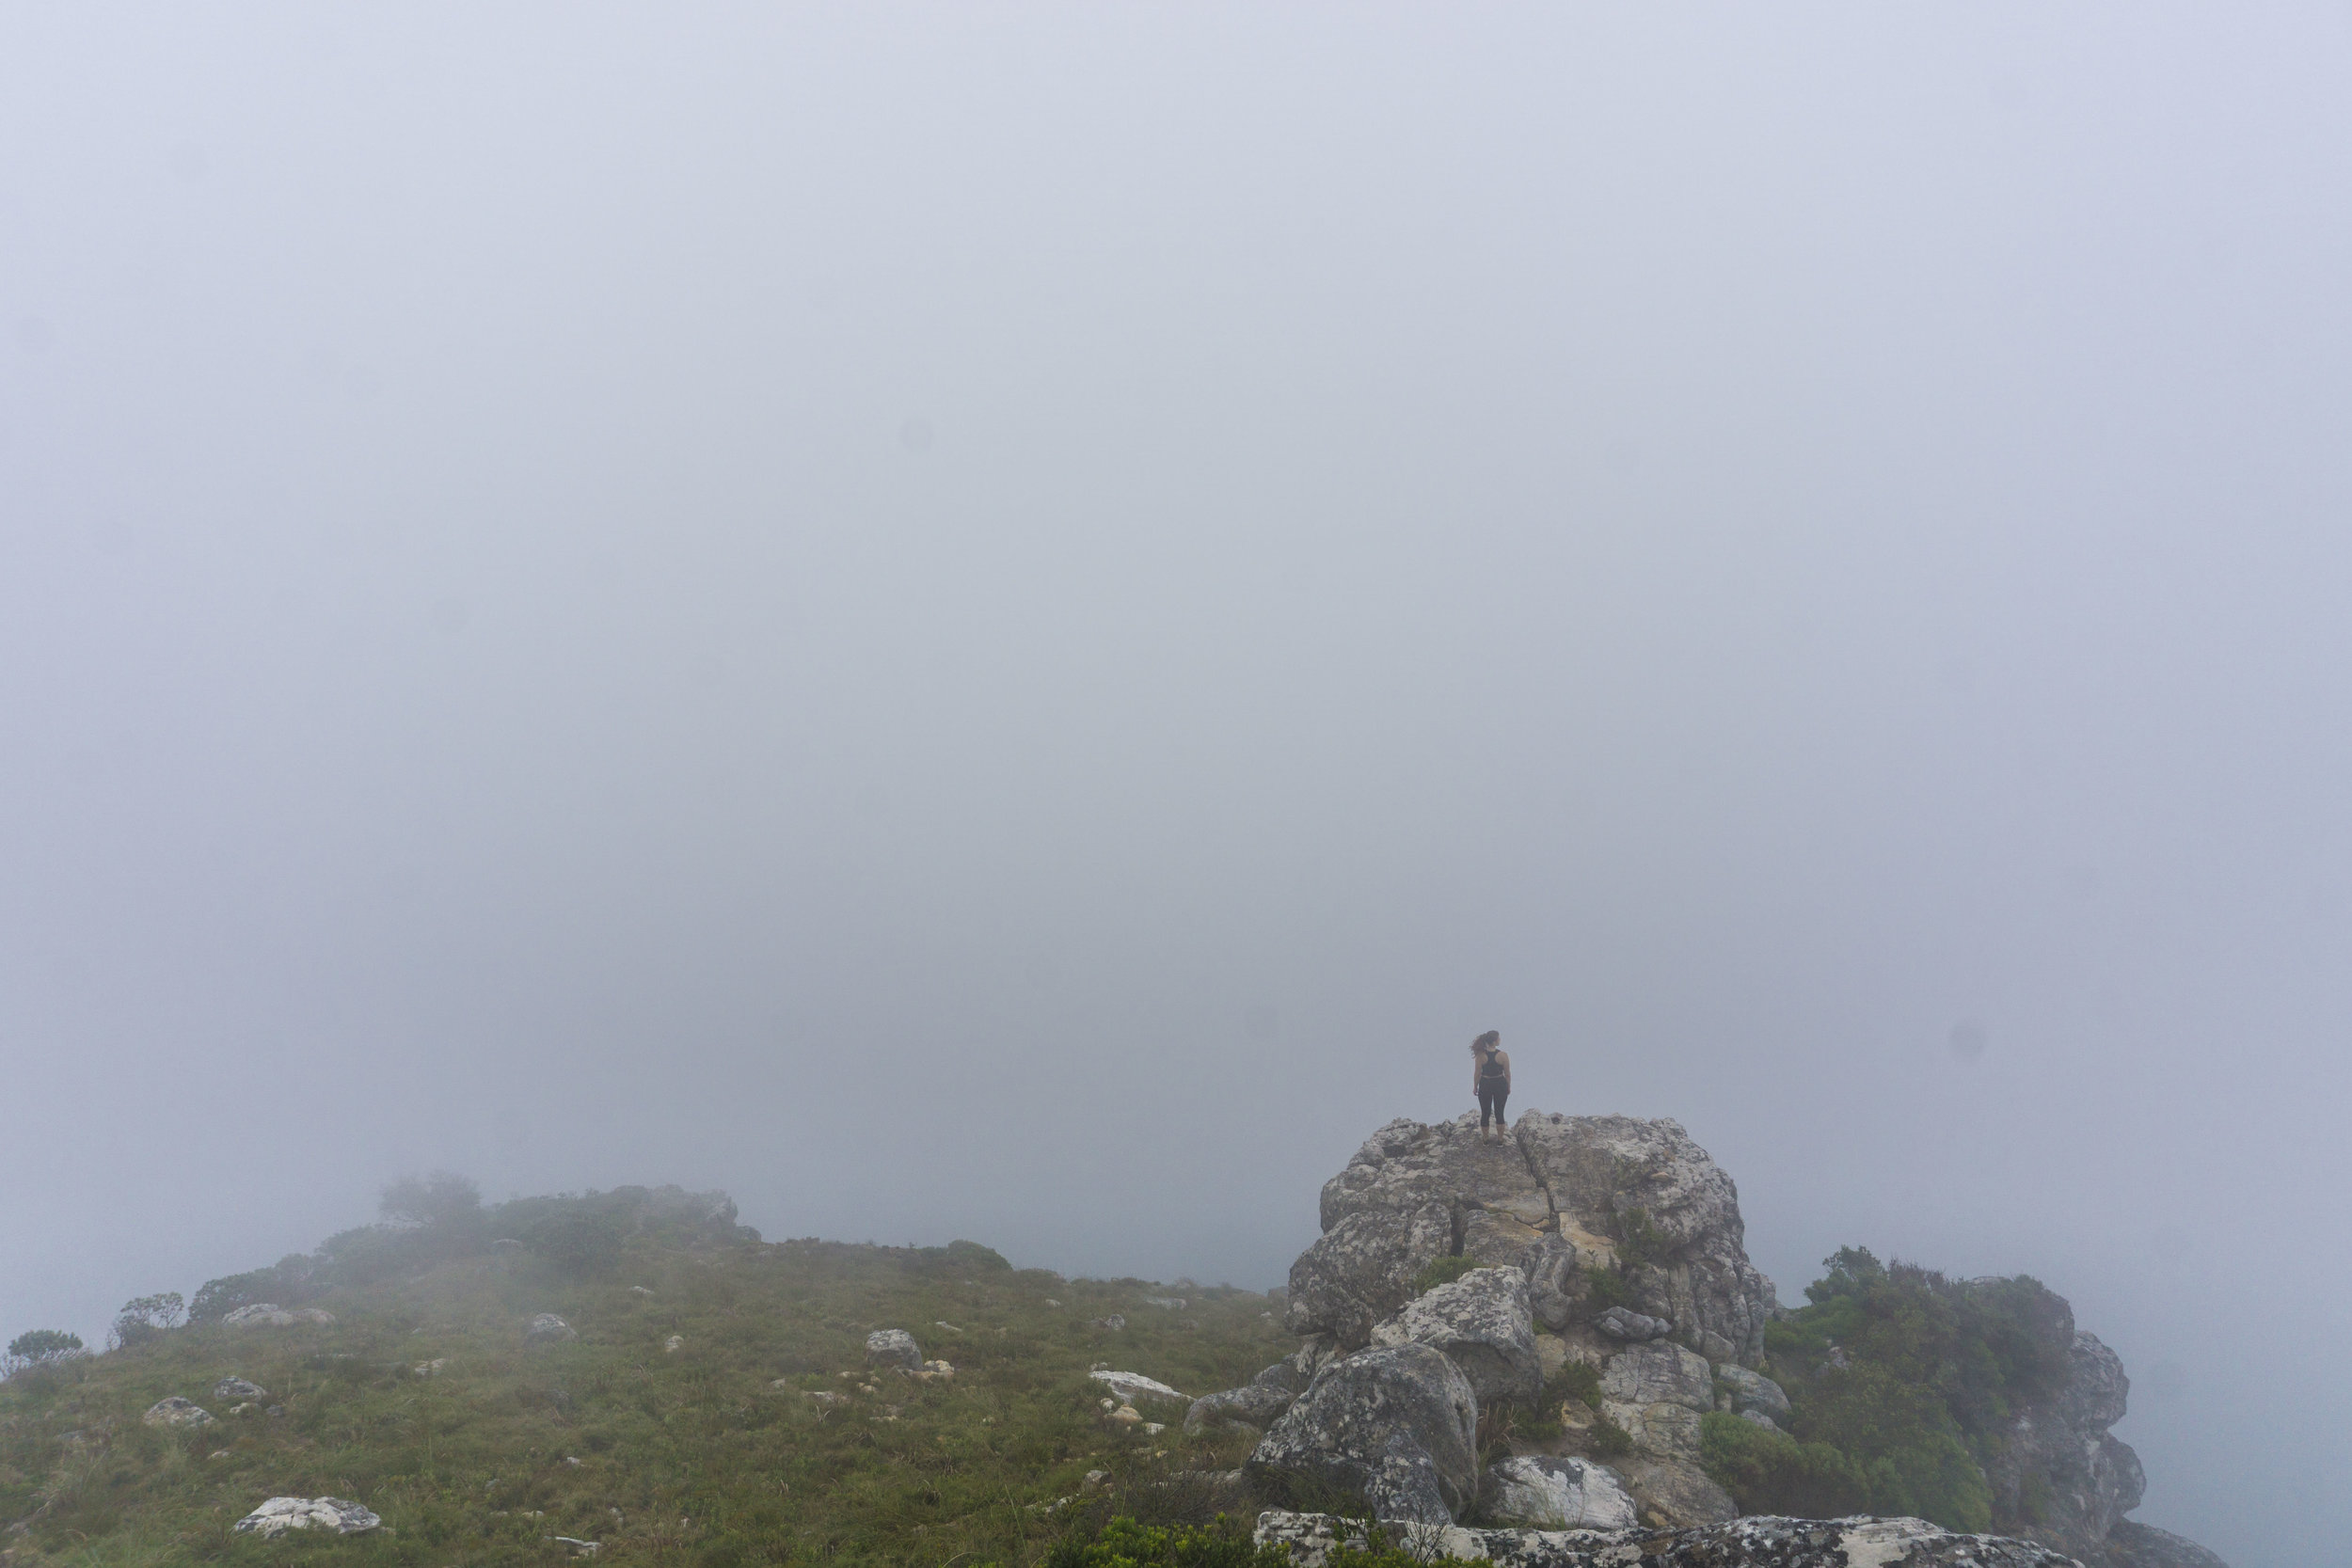 Chapman's Peak Hike - what a view!